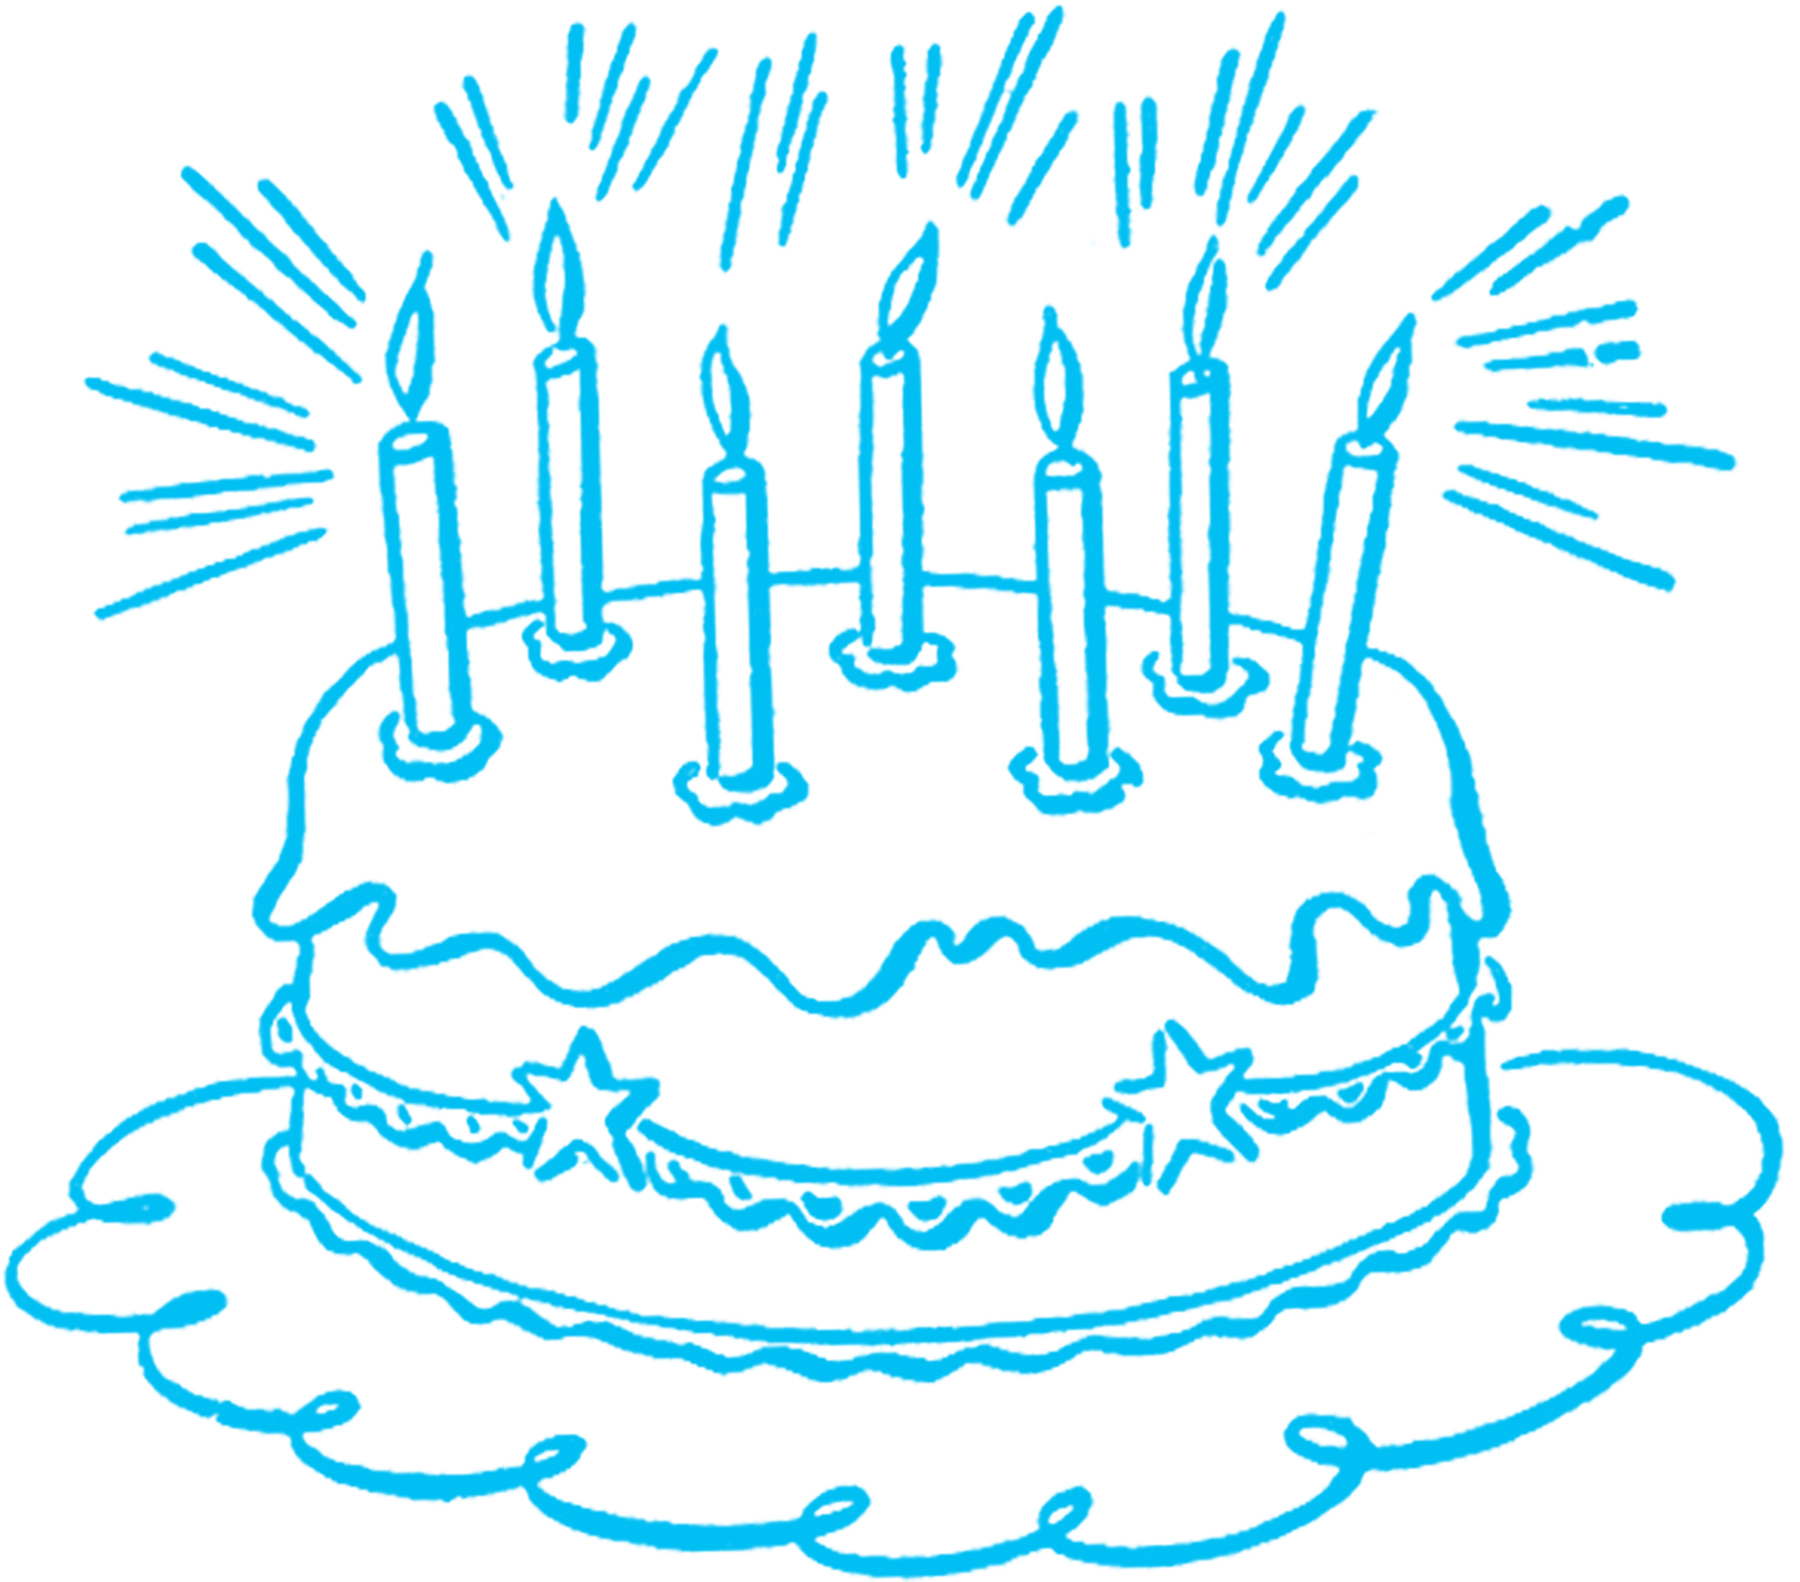 April clipart cake. Vintage birthday line art